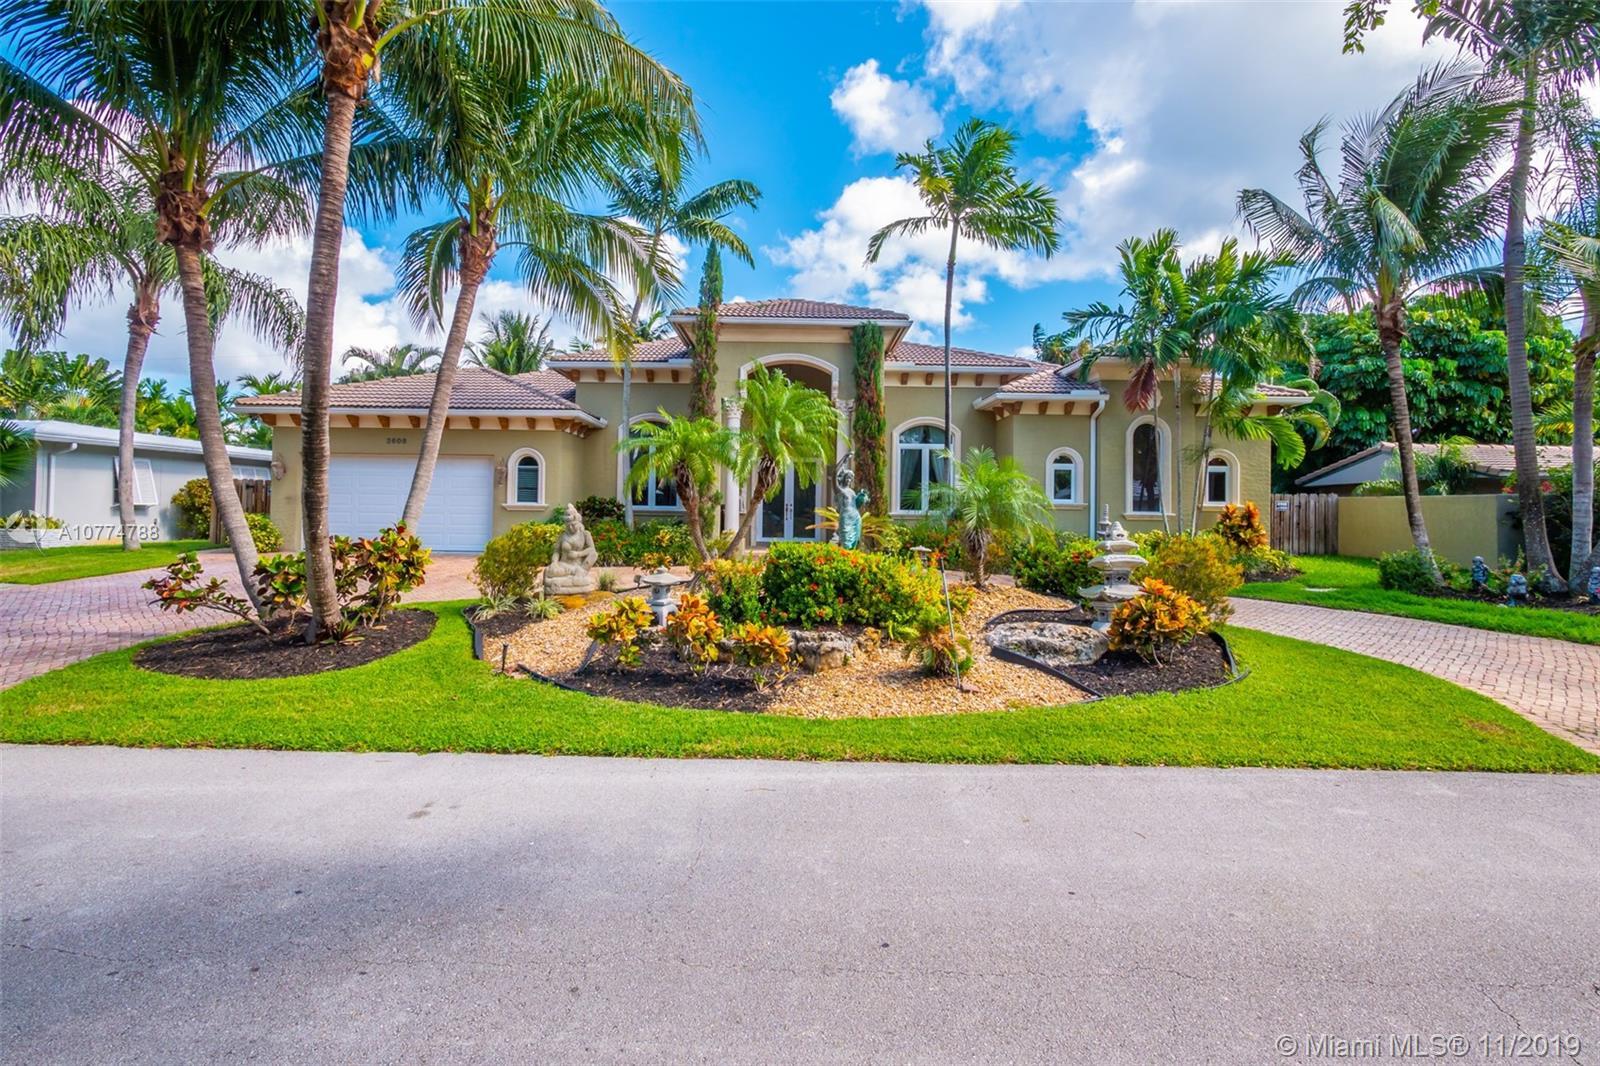 2608 NE 27th Way, Fort Lauderdale, FL 33306